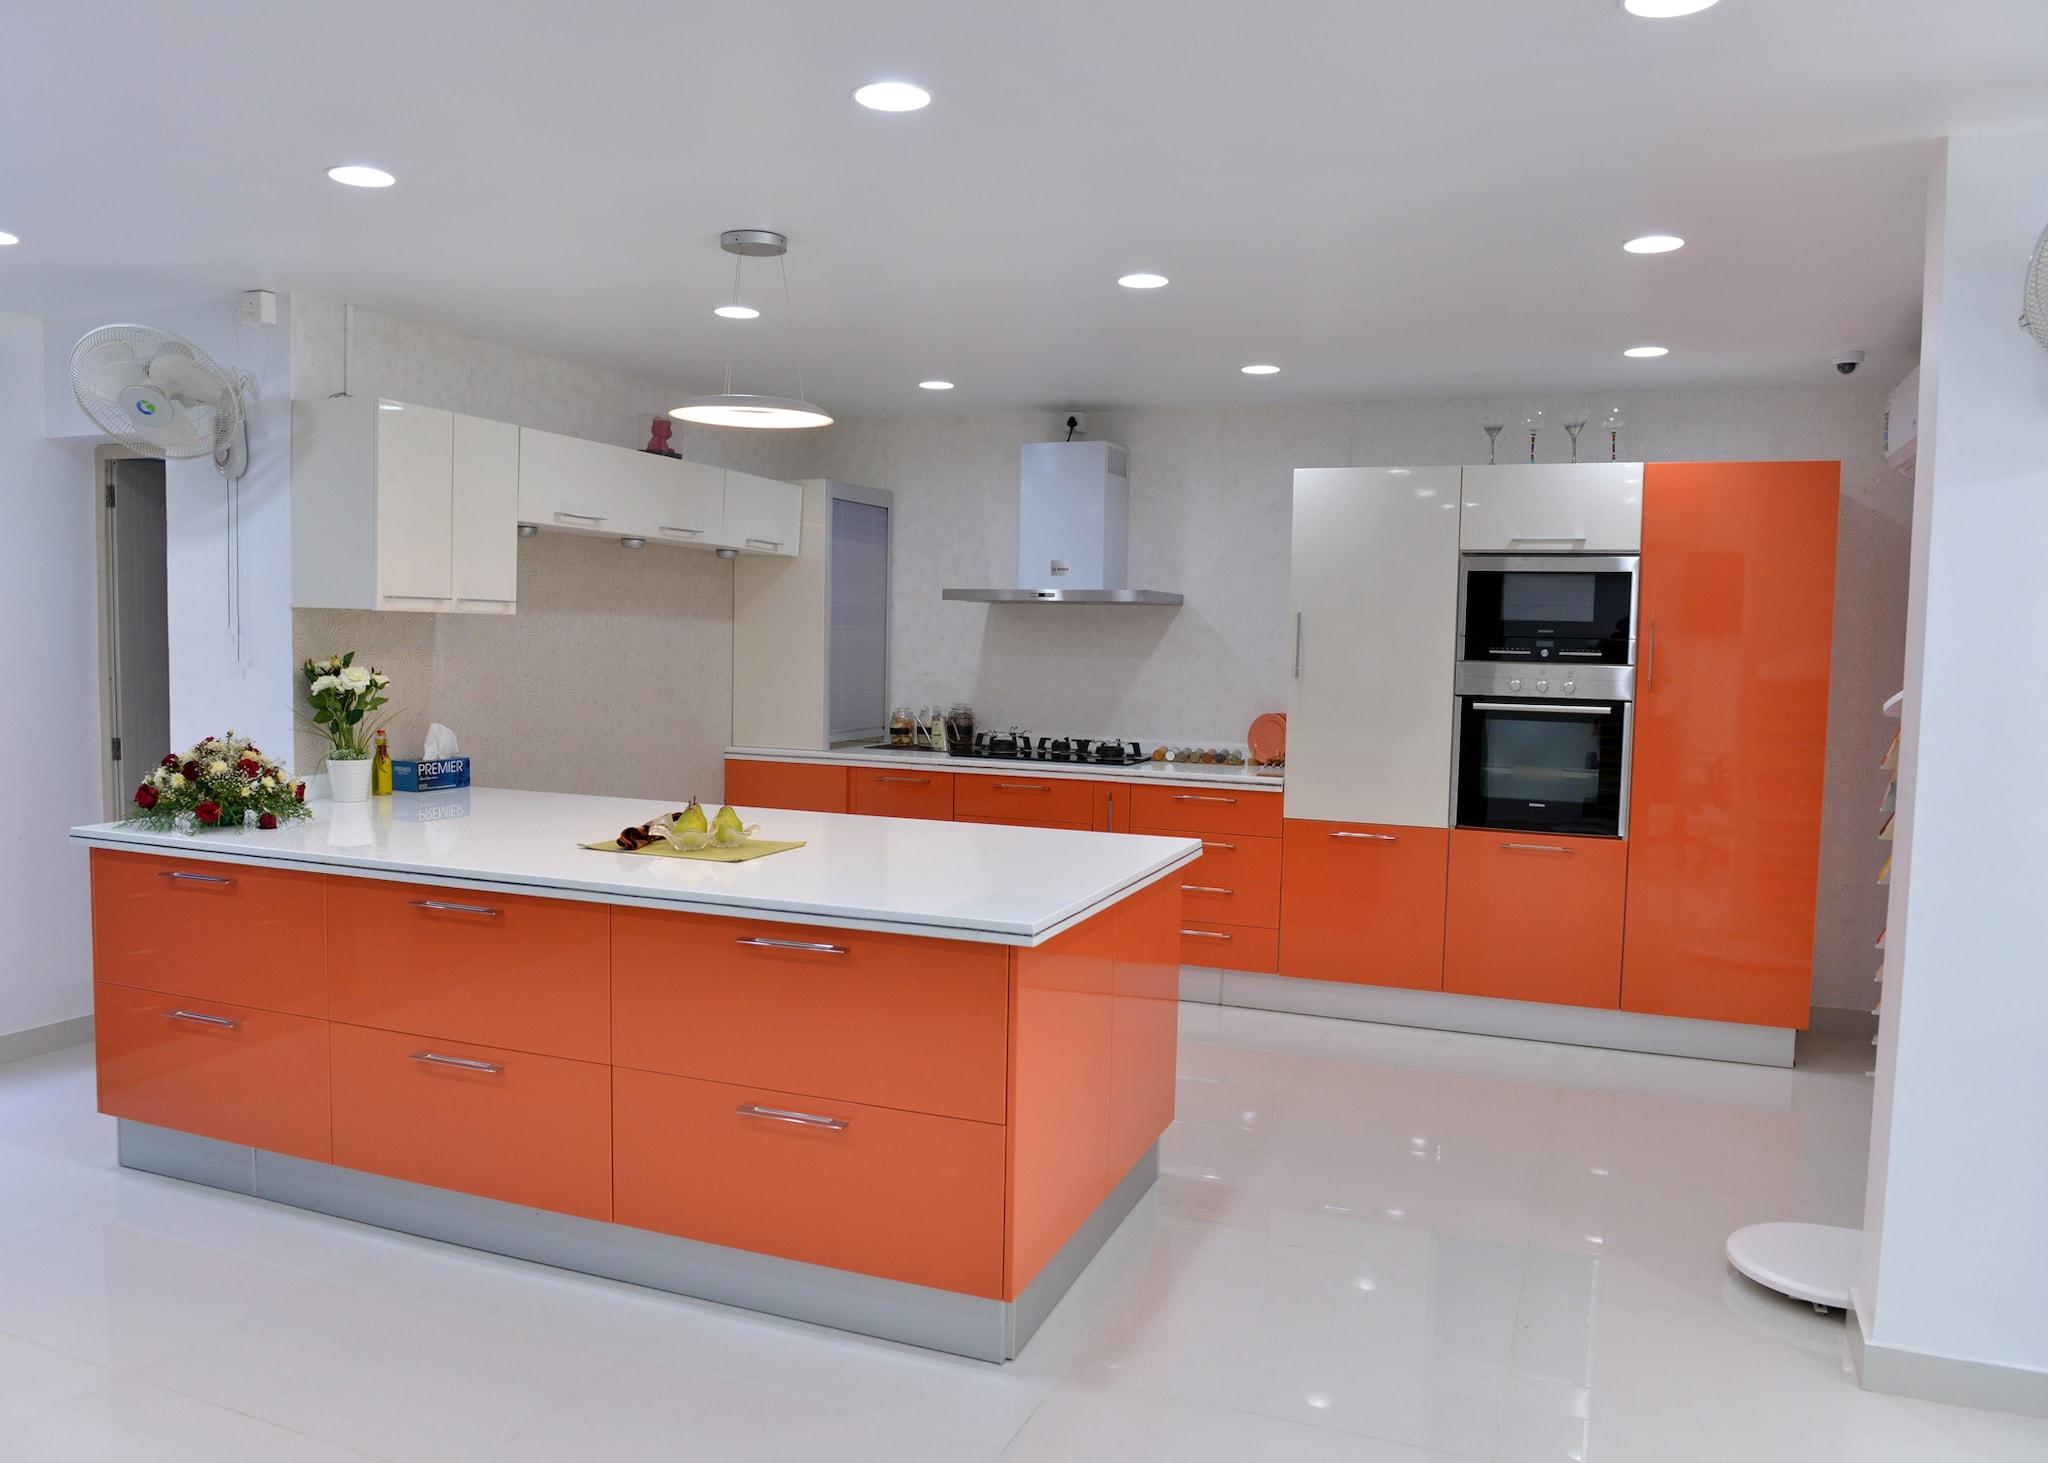 Godrej Kitchen Gallery, Thellakom - Furniture Dealers in Kottayam